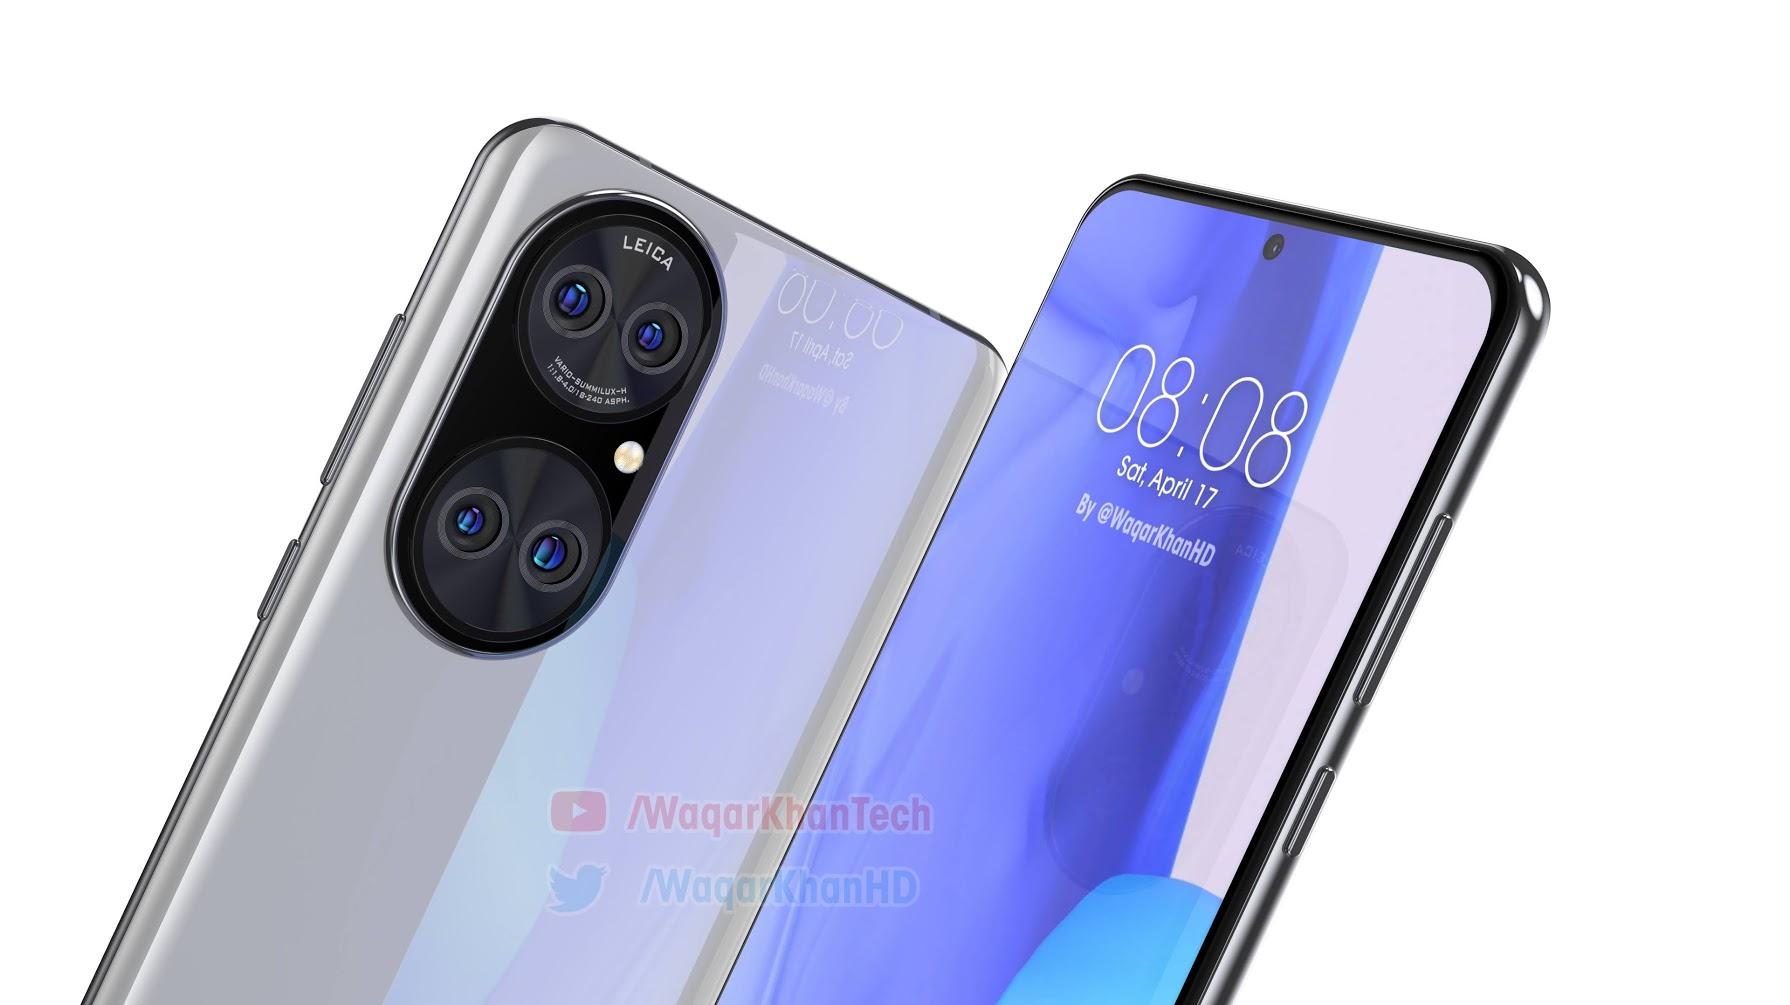 Качественные макеты Huawei P50 Huawei  - huawei_p50_pokazalsa_na_realistichnyh_renederah_video_3